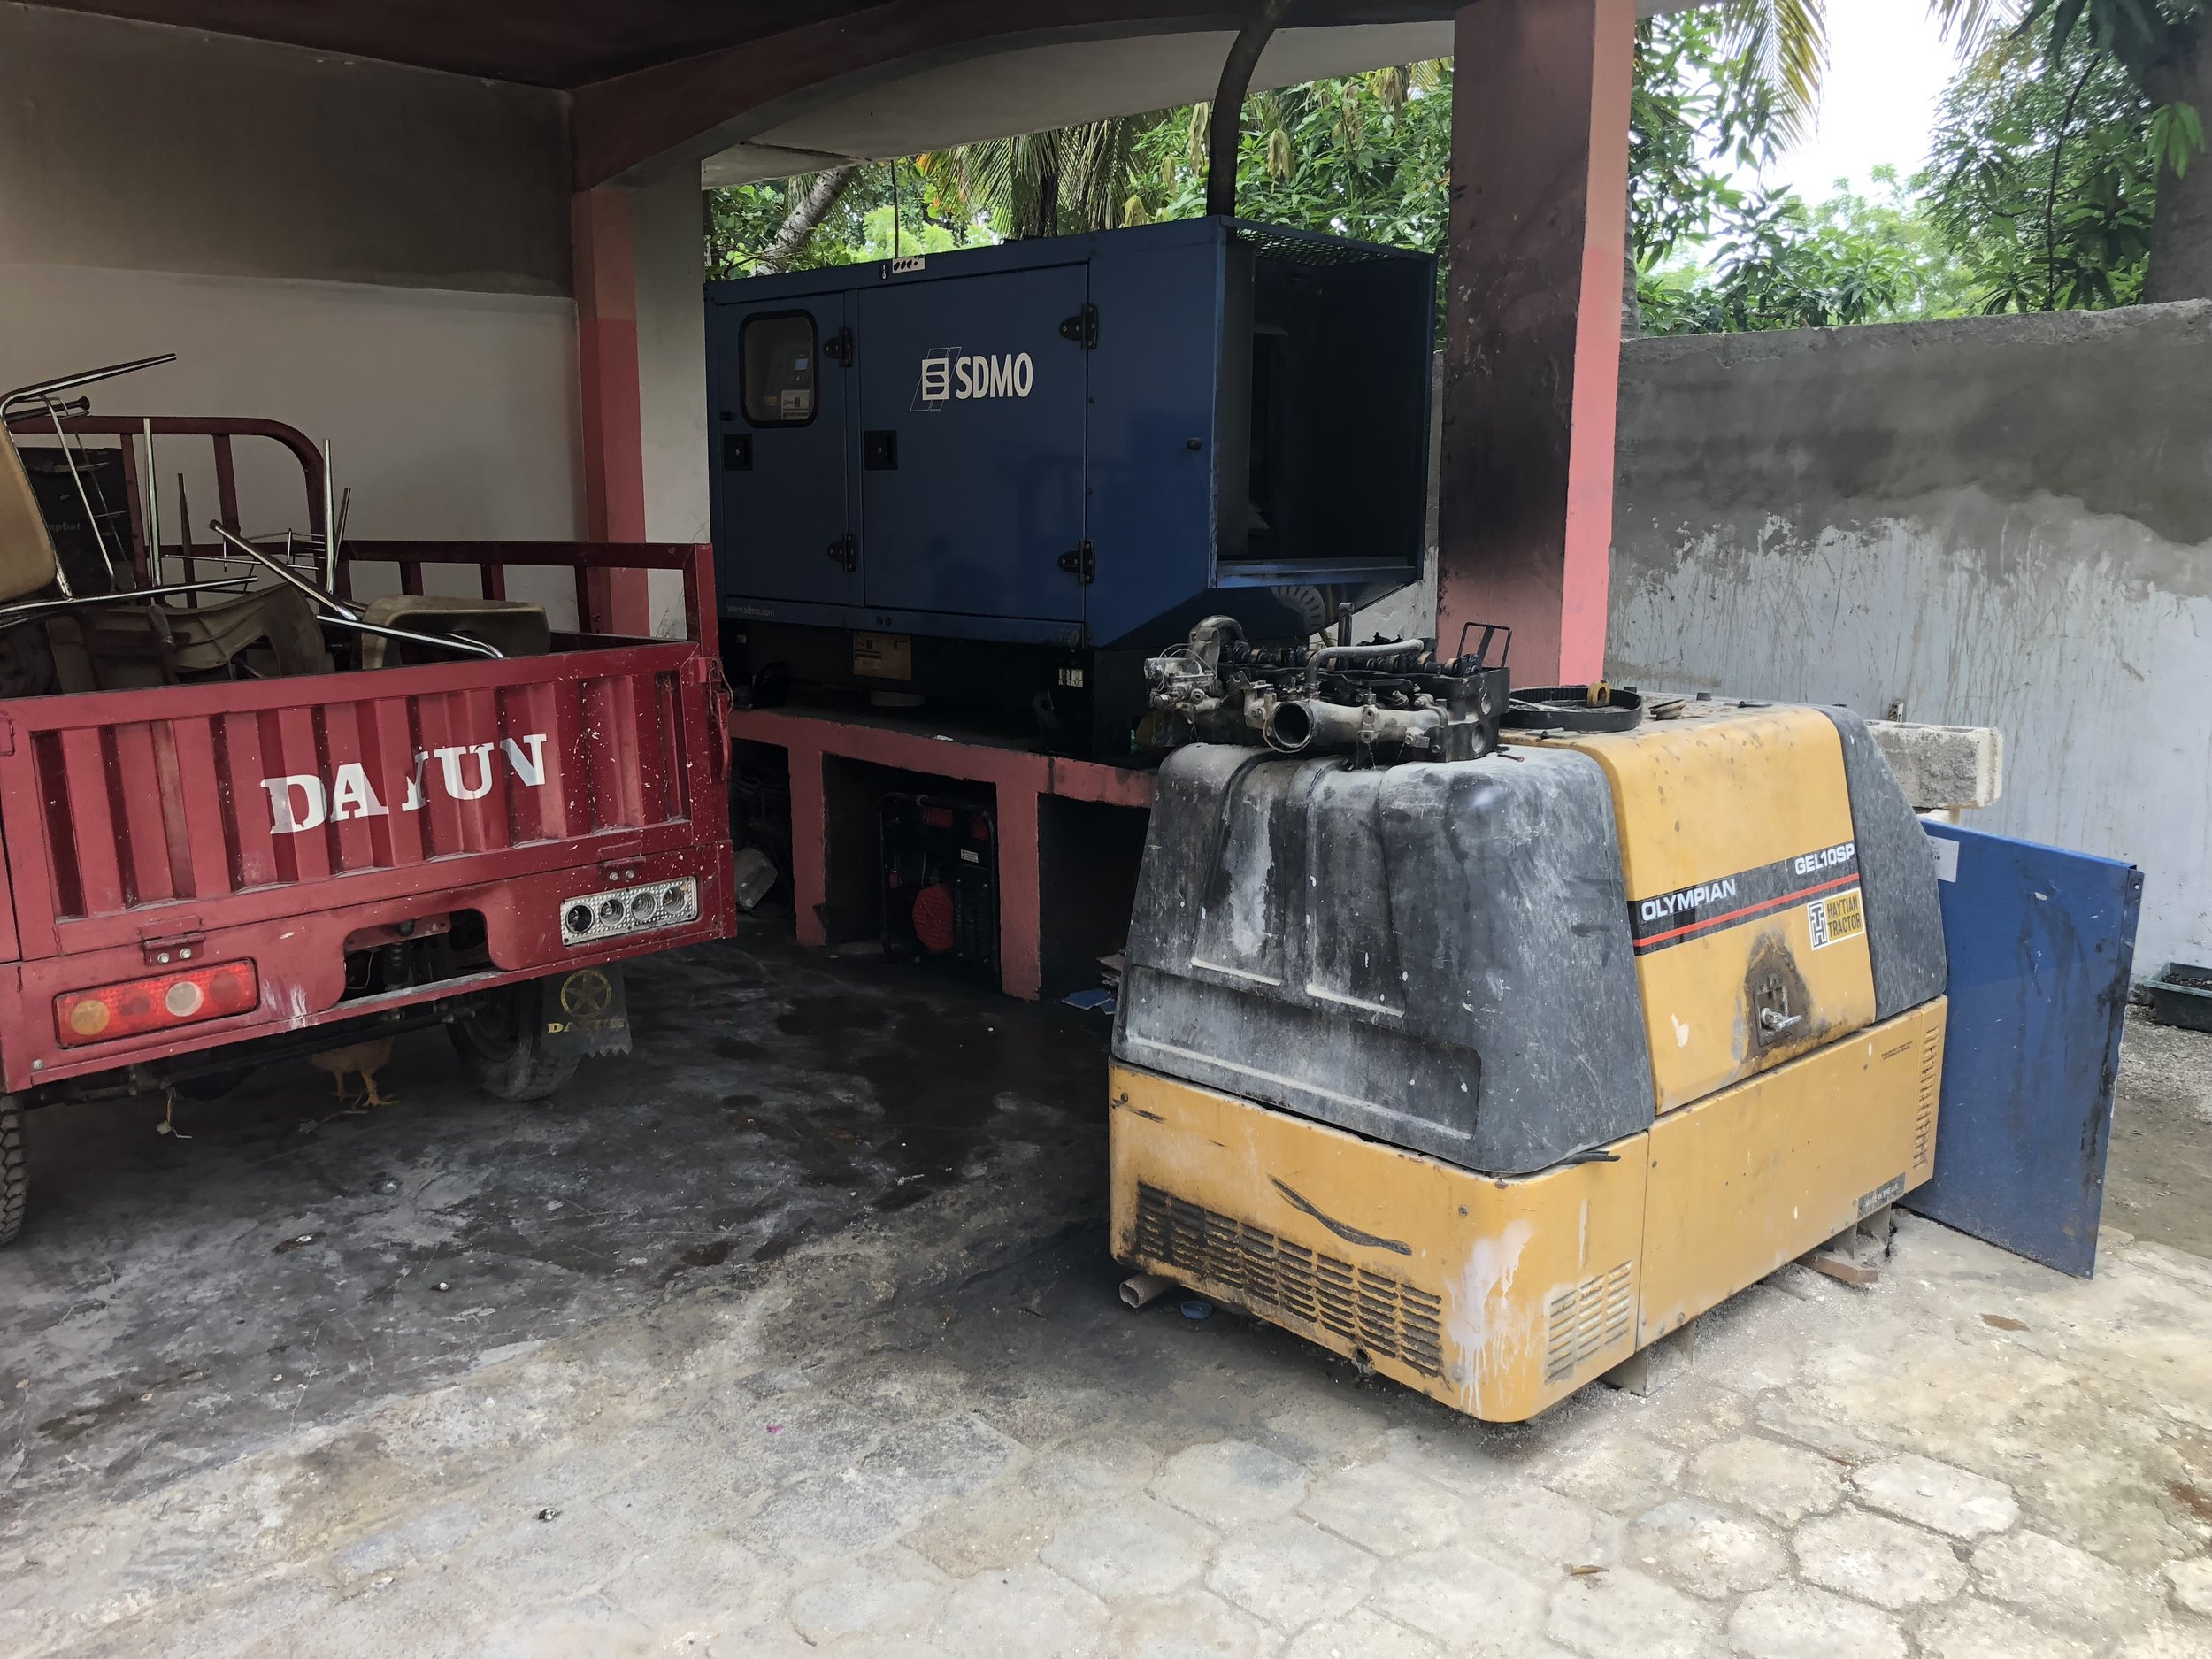 Damou Generator